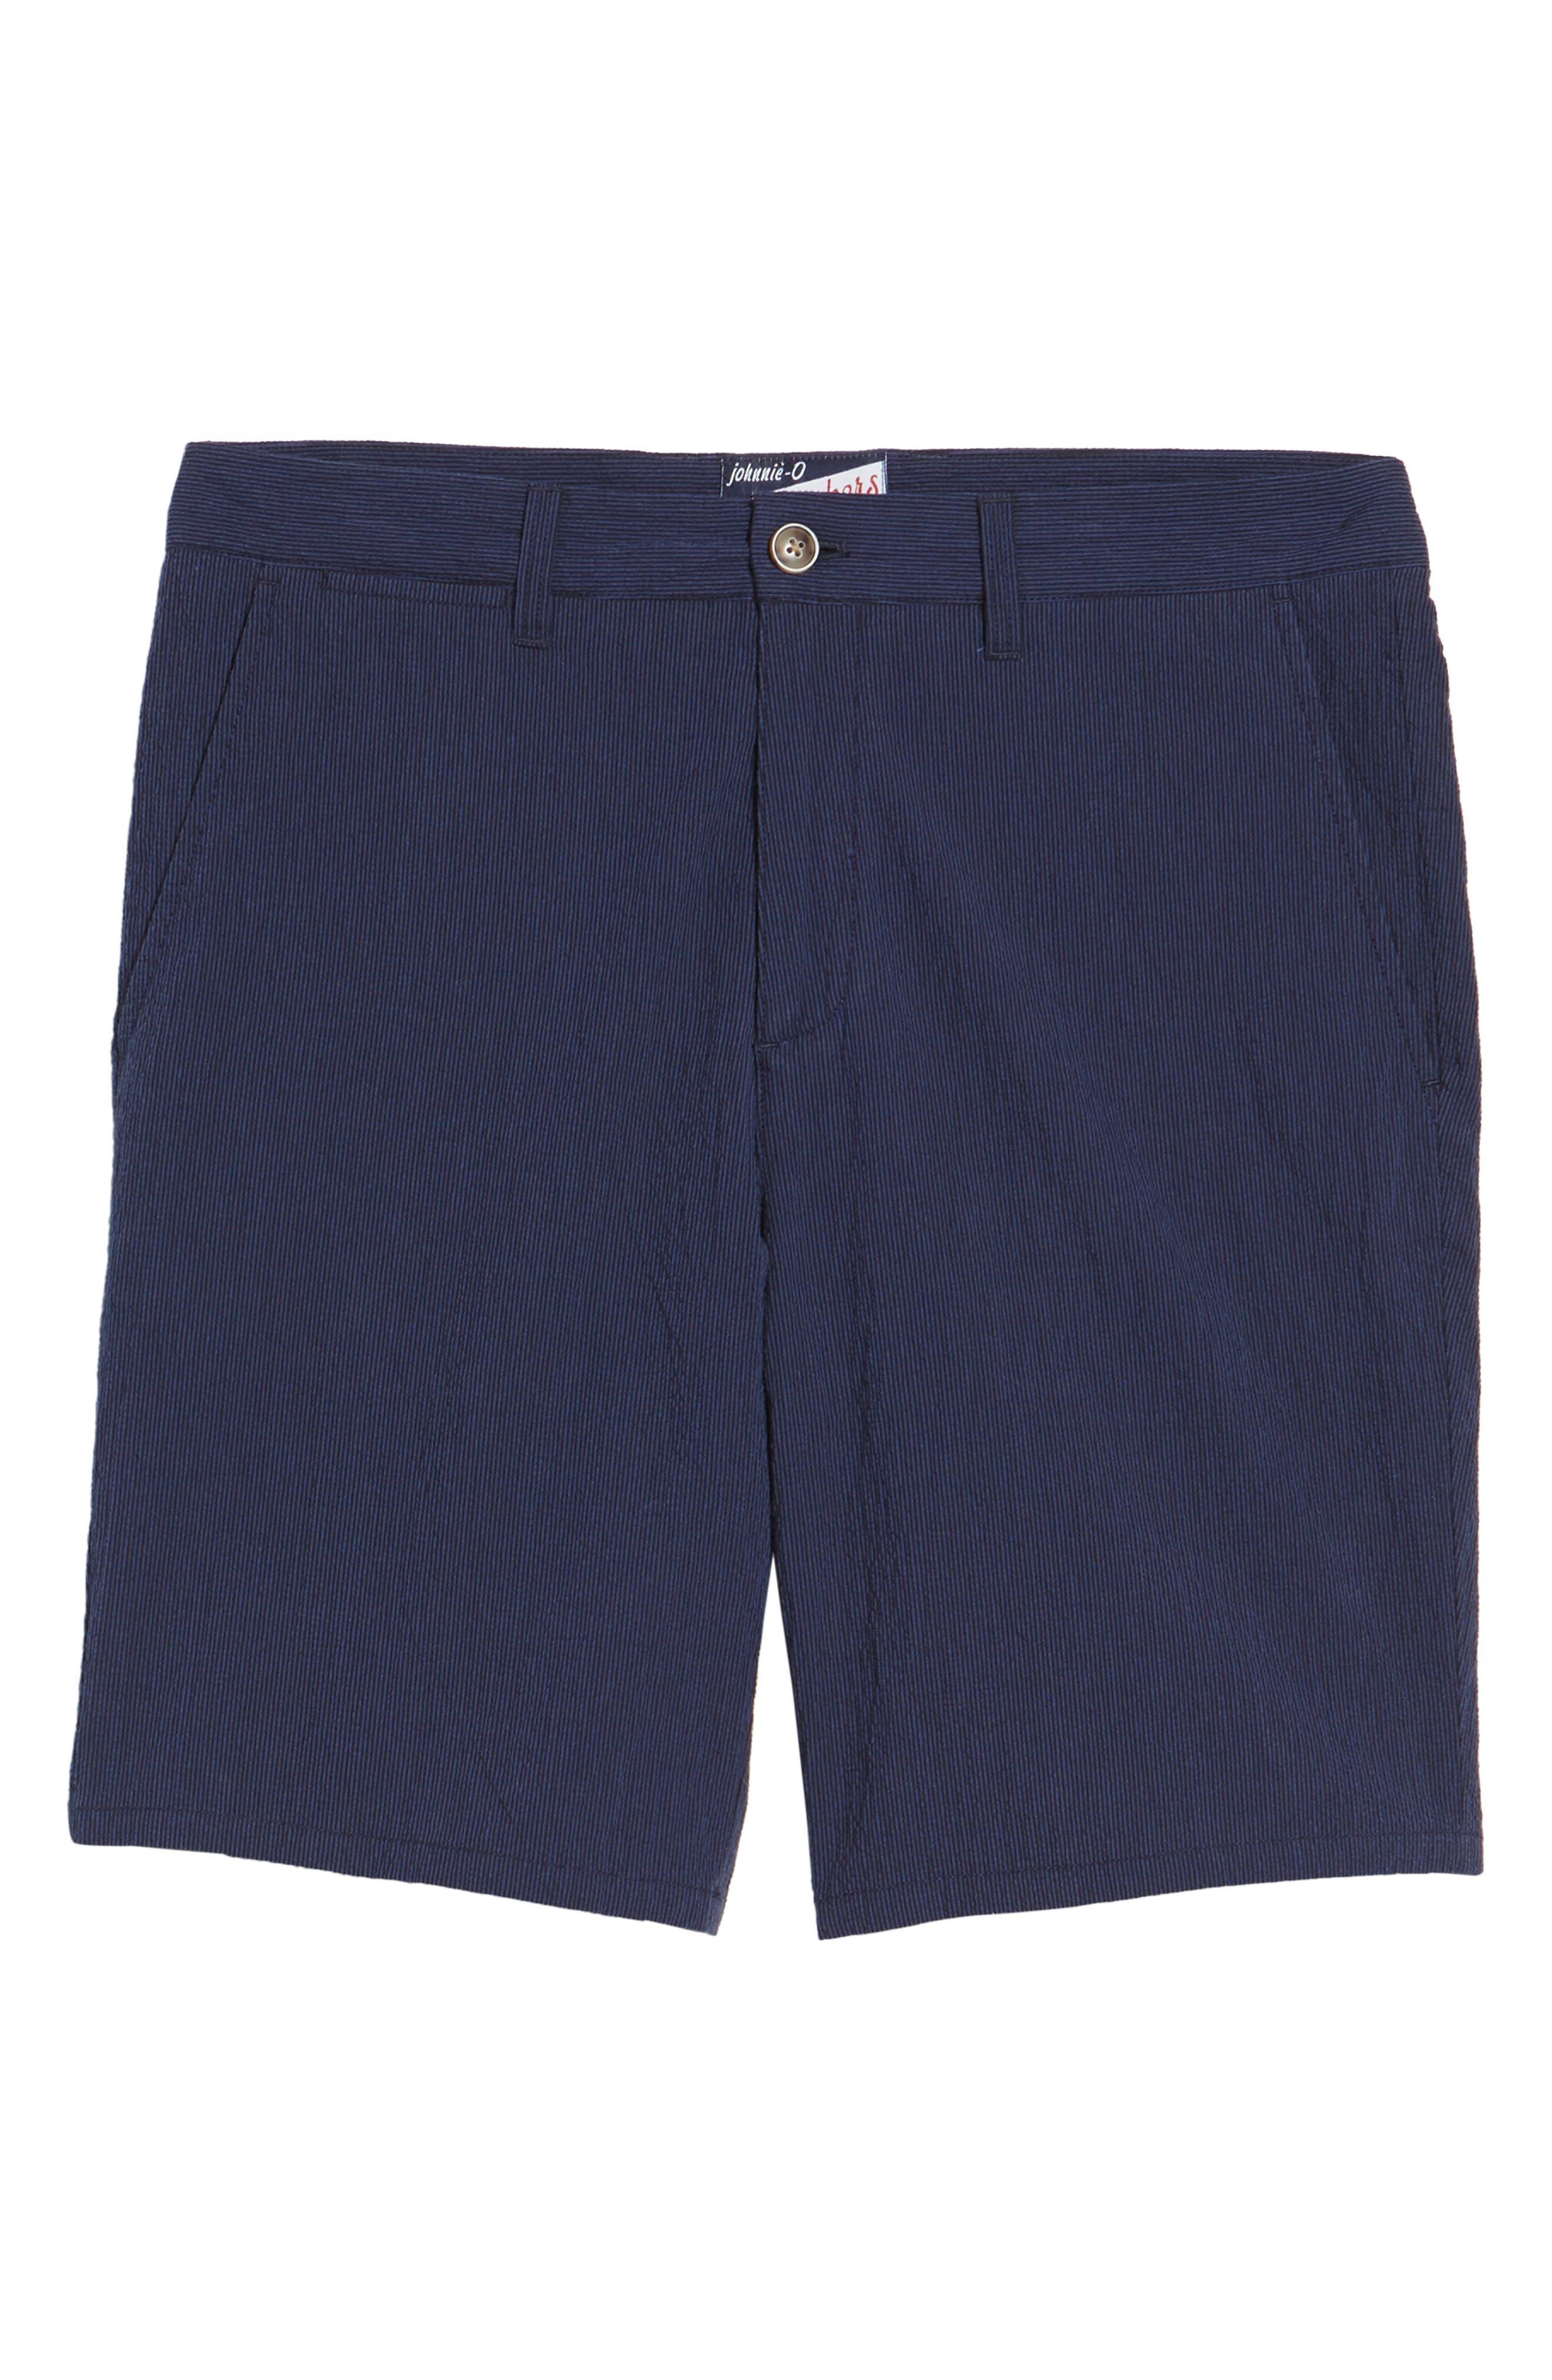 Bryson Regular Fit Shorts,                             Alternate thumbnail 6, color,                             Ripple